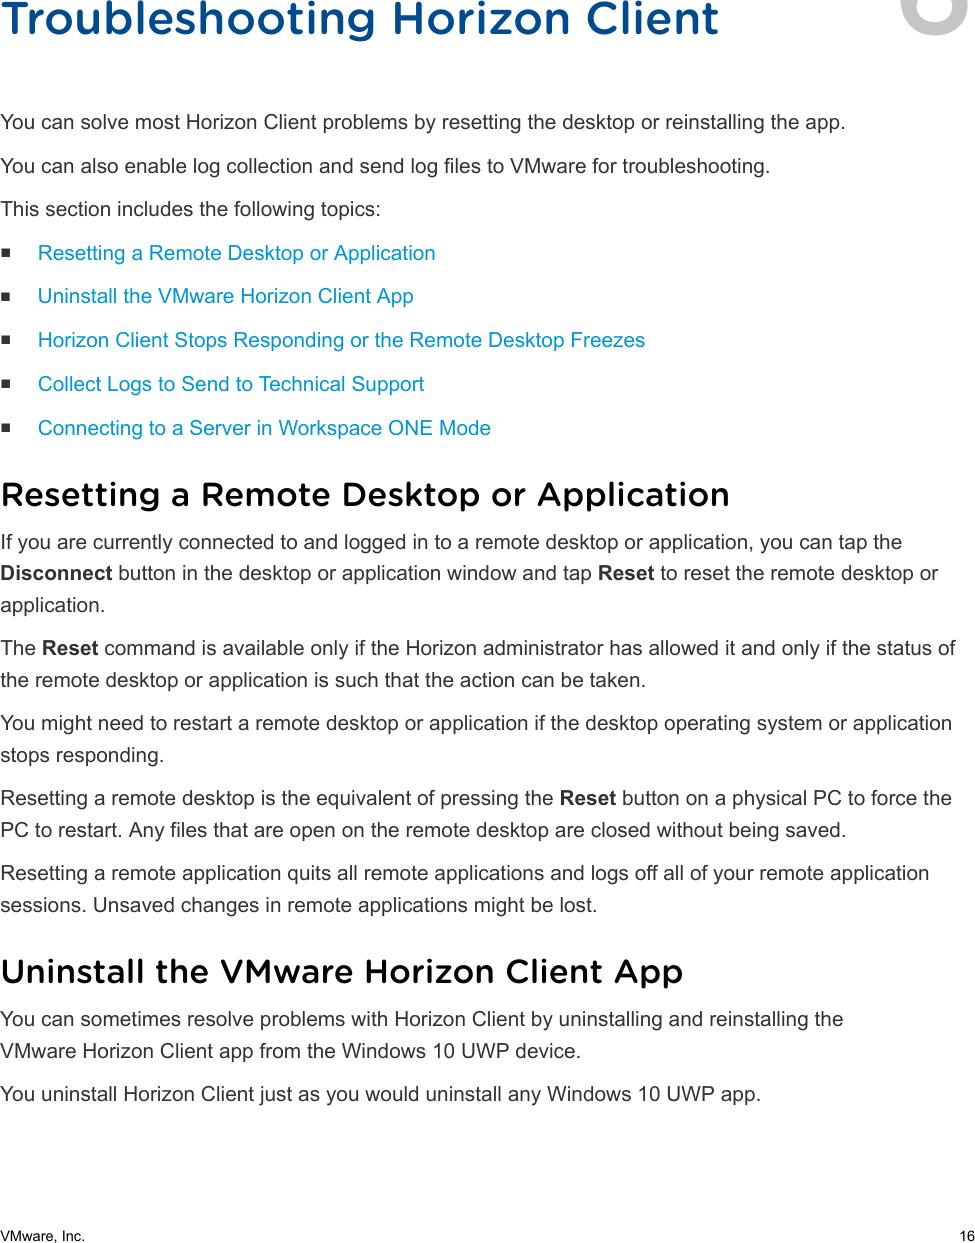 VMware Horizon Client For Windows 10 UWP User Guide 10  4 6